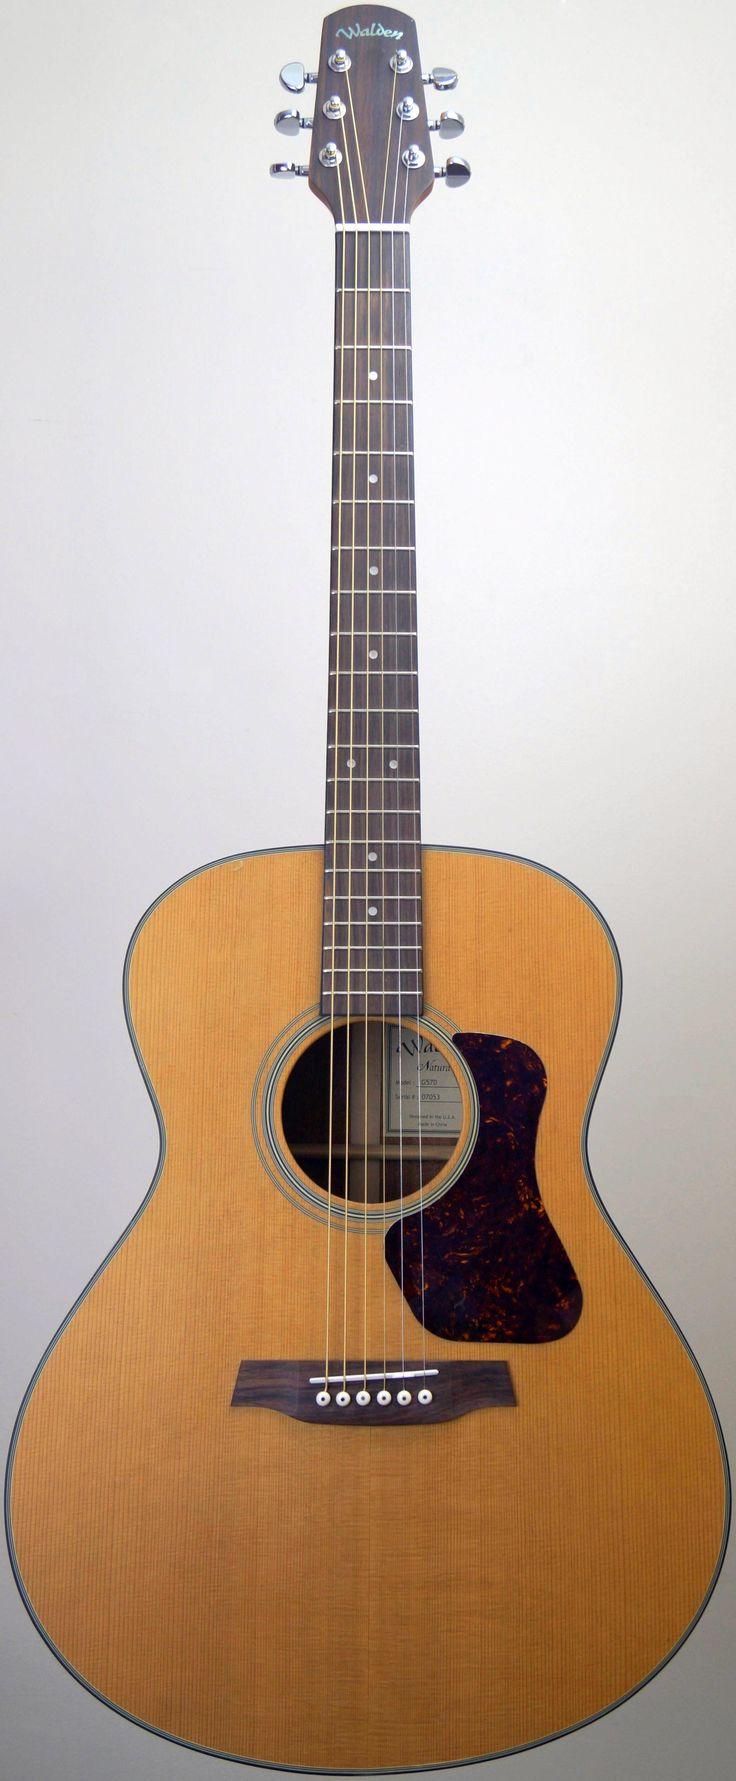 "Walden G570 ""Natura"" acoustic Guitar at Ukulele Corner --- https://www.pinterest.com/lardyfatboy/"